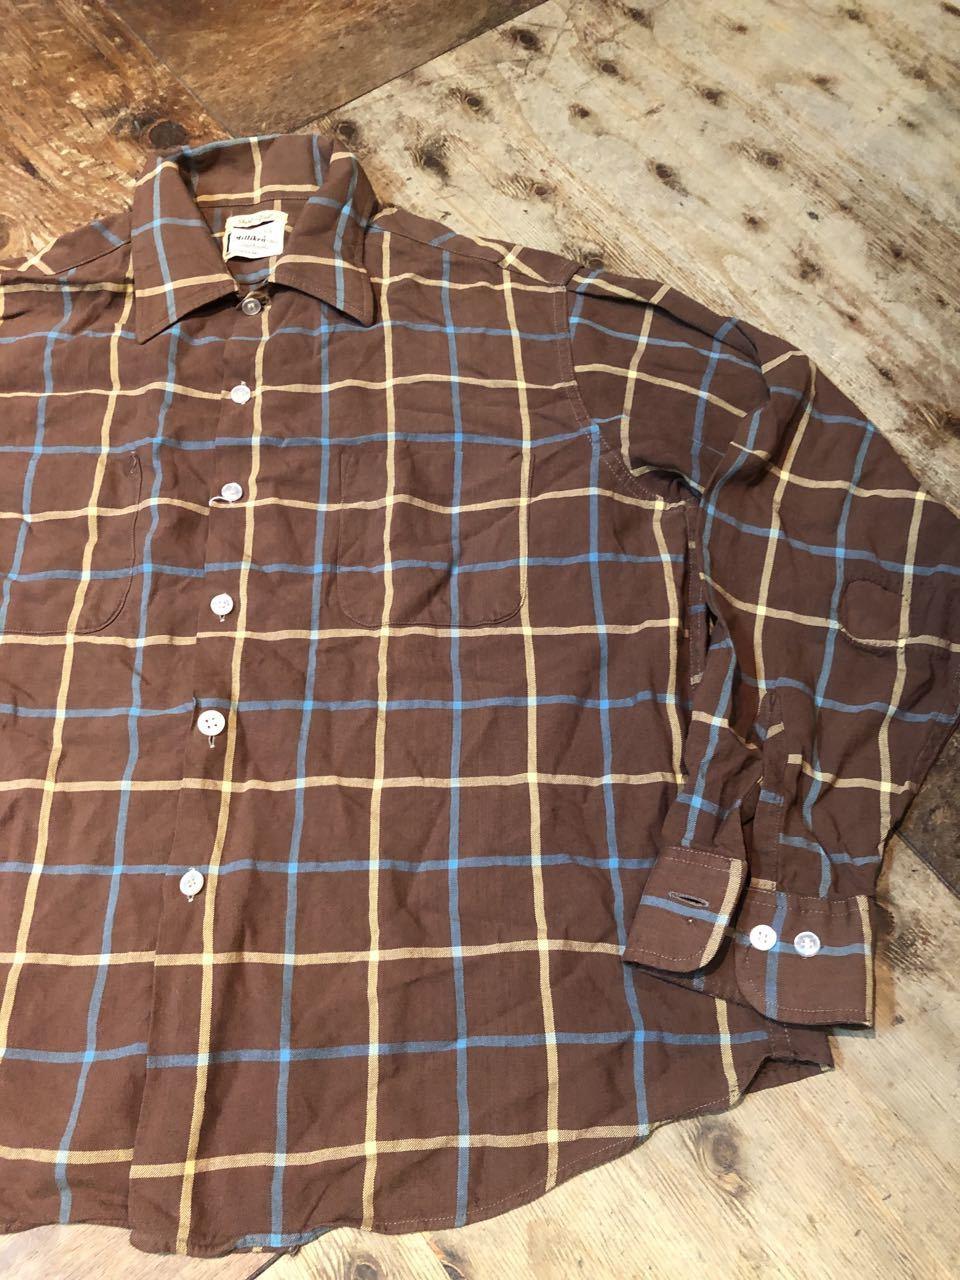 2月8日(土)入荷!60s Sears shirts! _c0144020_13124540.jpg